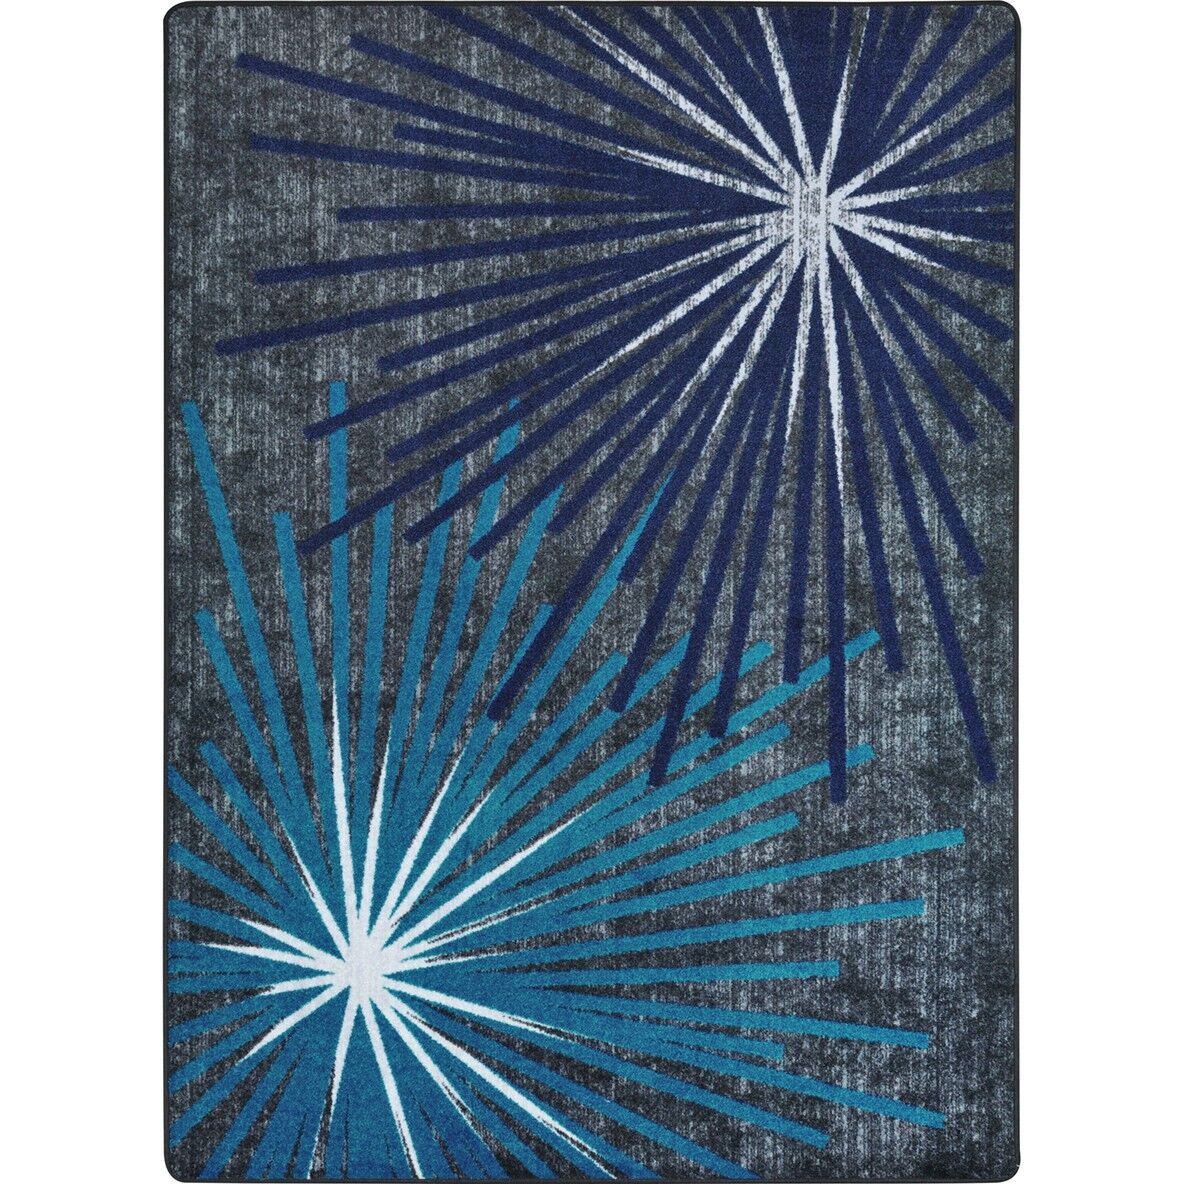 One-of-a-Kind Frasher Sputnik Hand Woven Blue/Gray Area Rug Rug Size: Rectangle 3'10